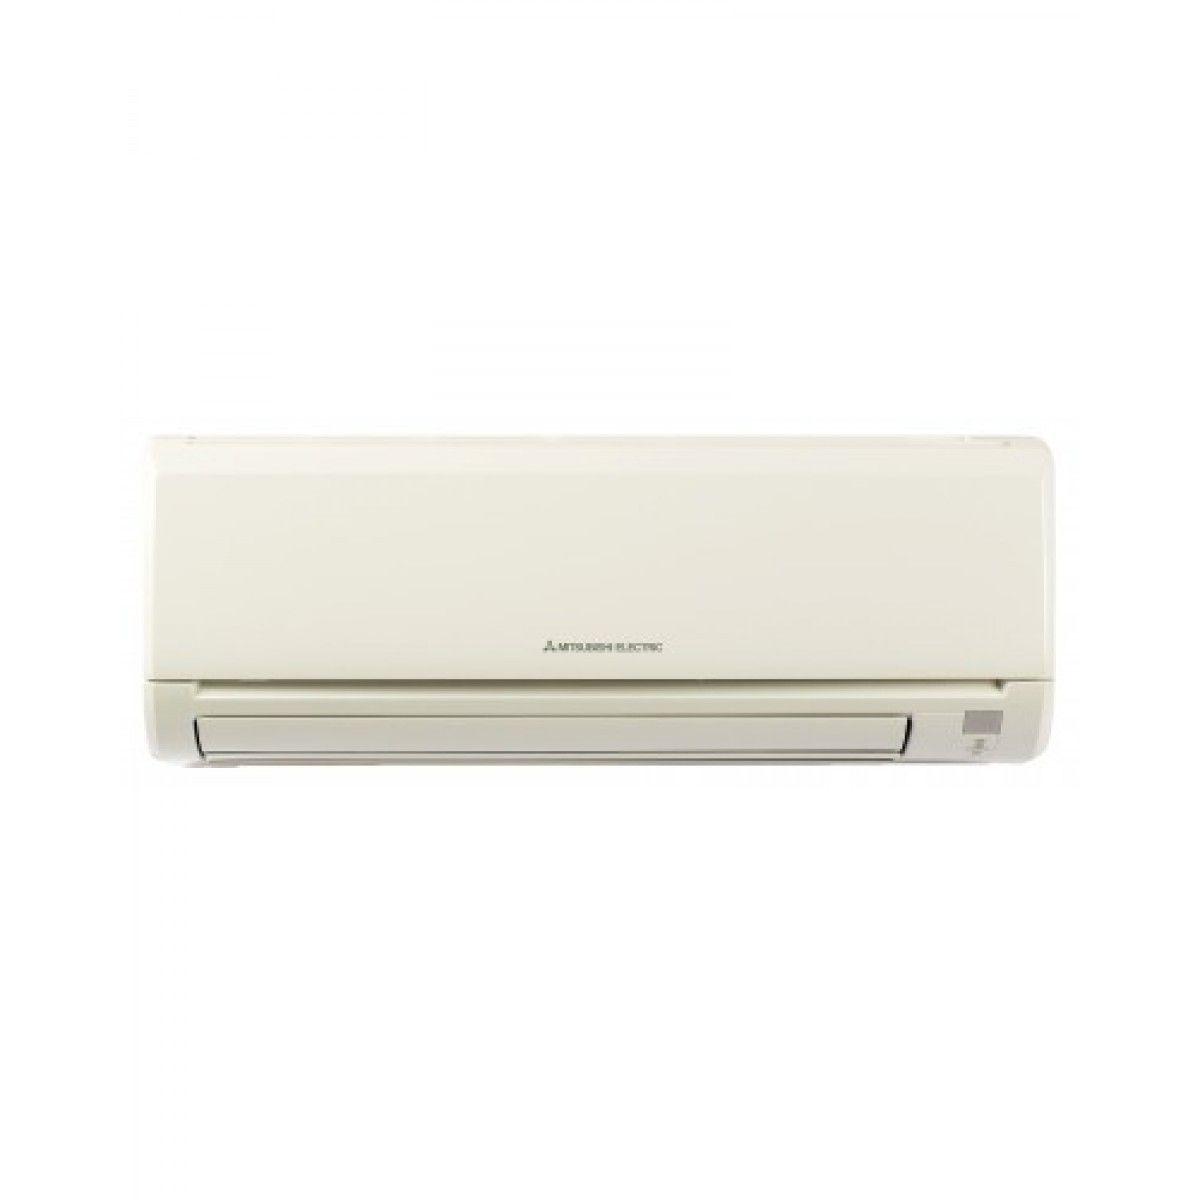 Mitsubishi Split Ac Review: Mitsubishi 18K BTU Hyper Heat Indoor Unit / MSZFH18NA